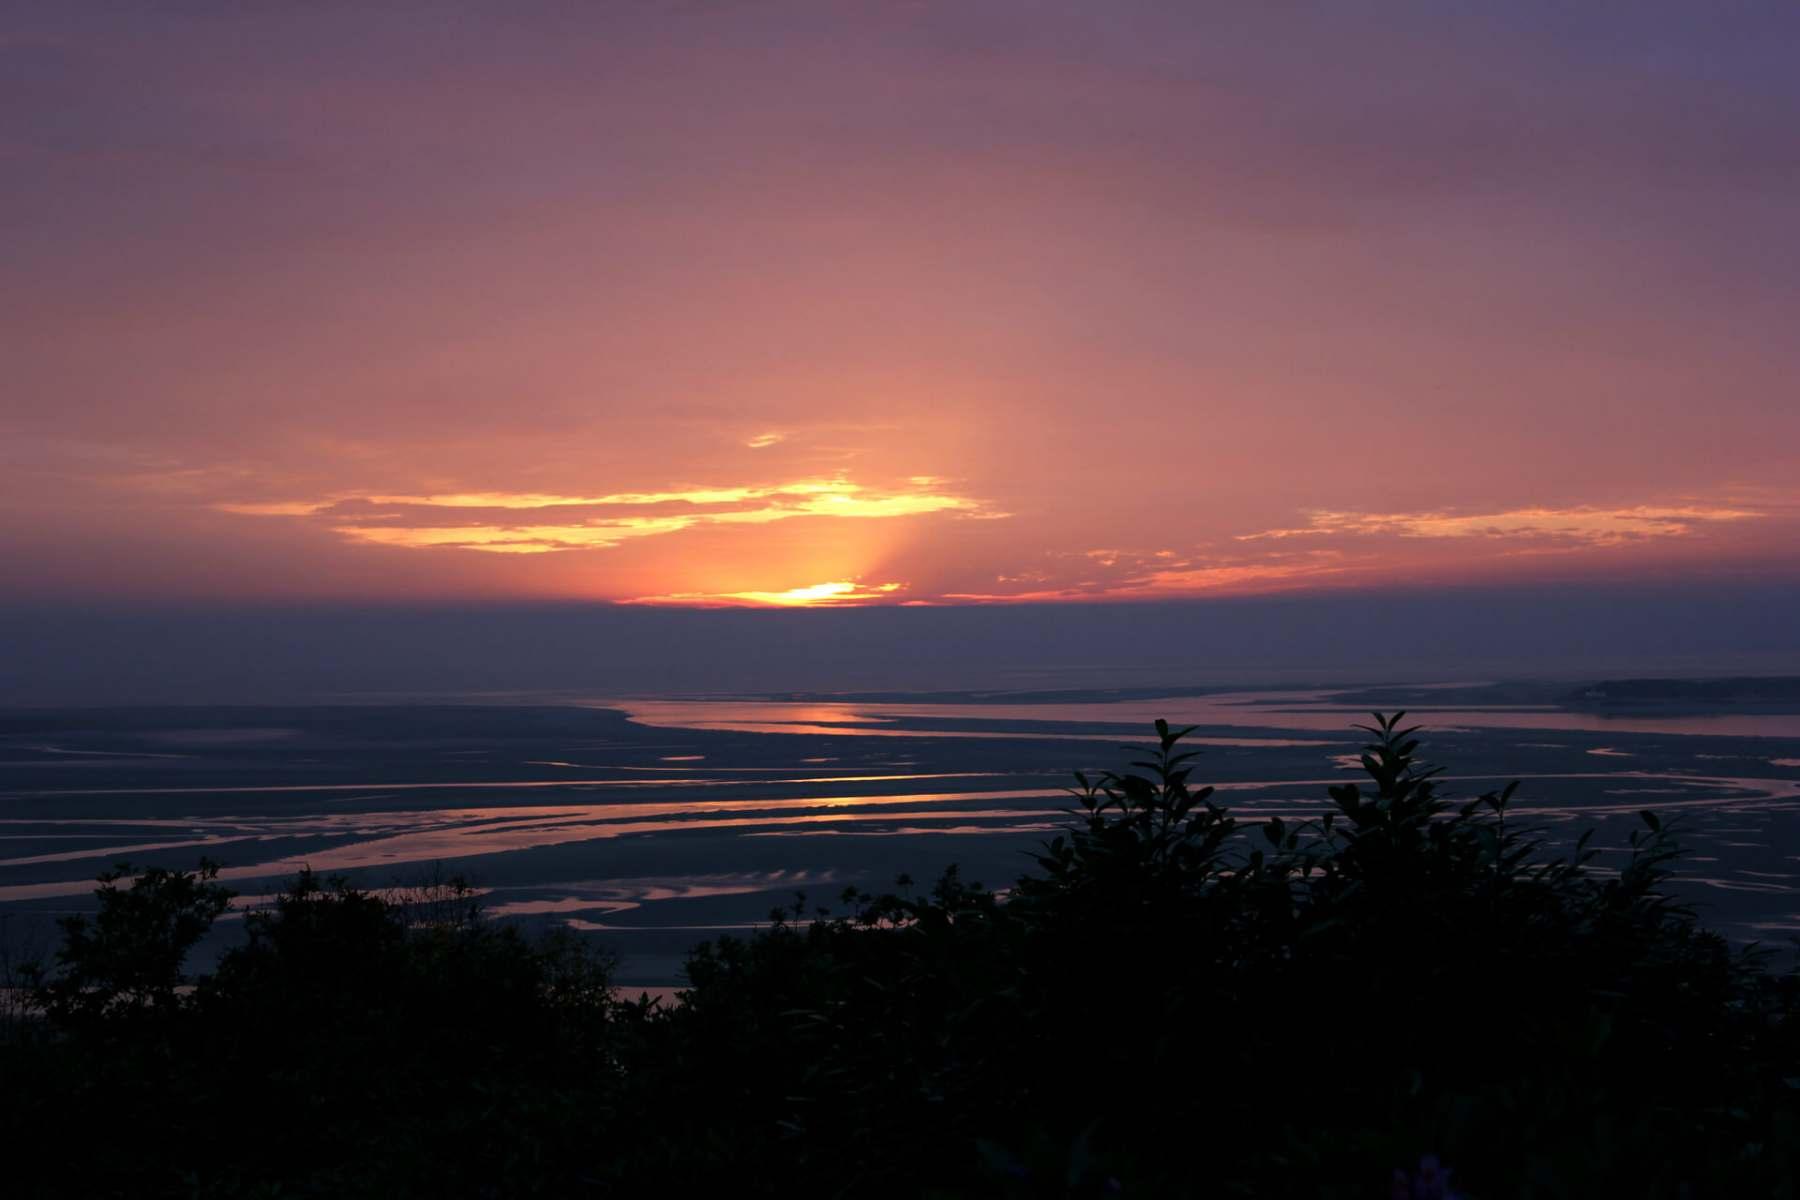 sunset-over-portmeirion-estuary-3